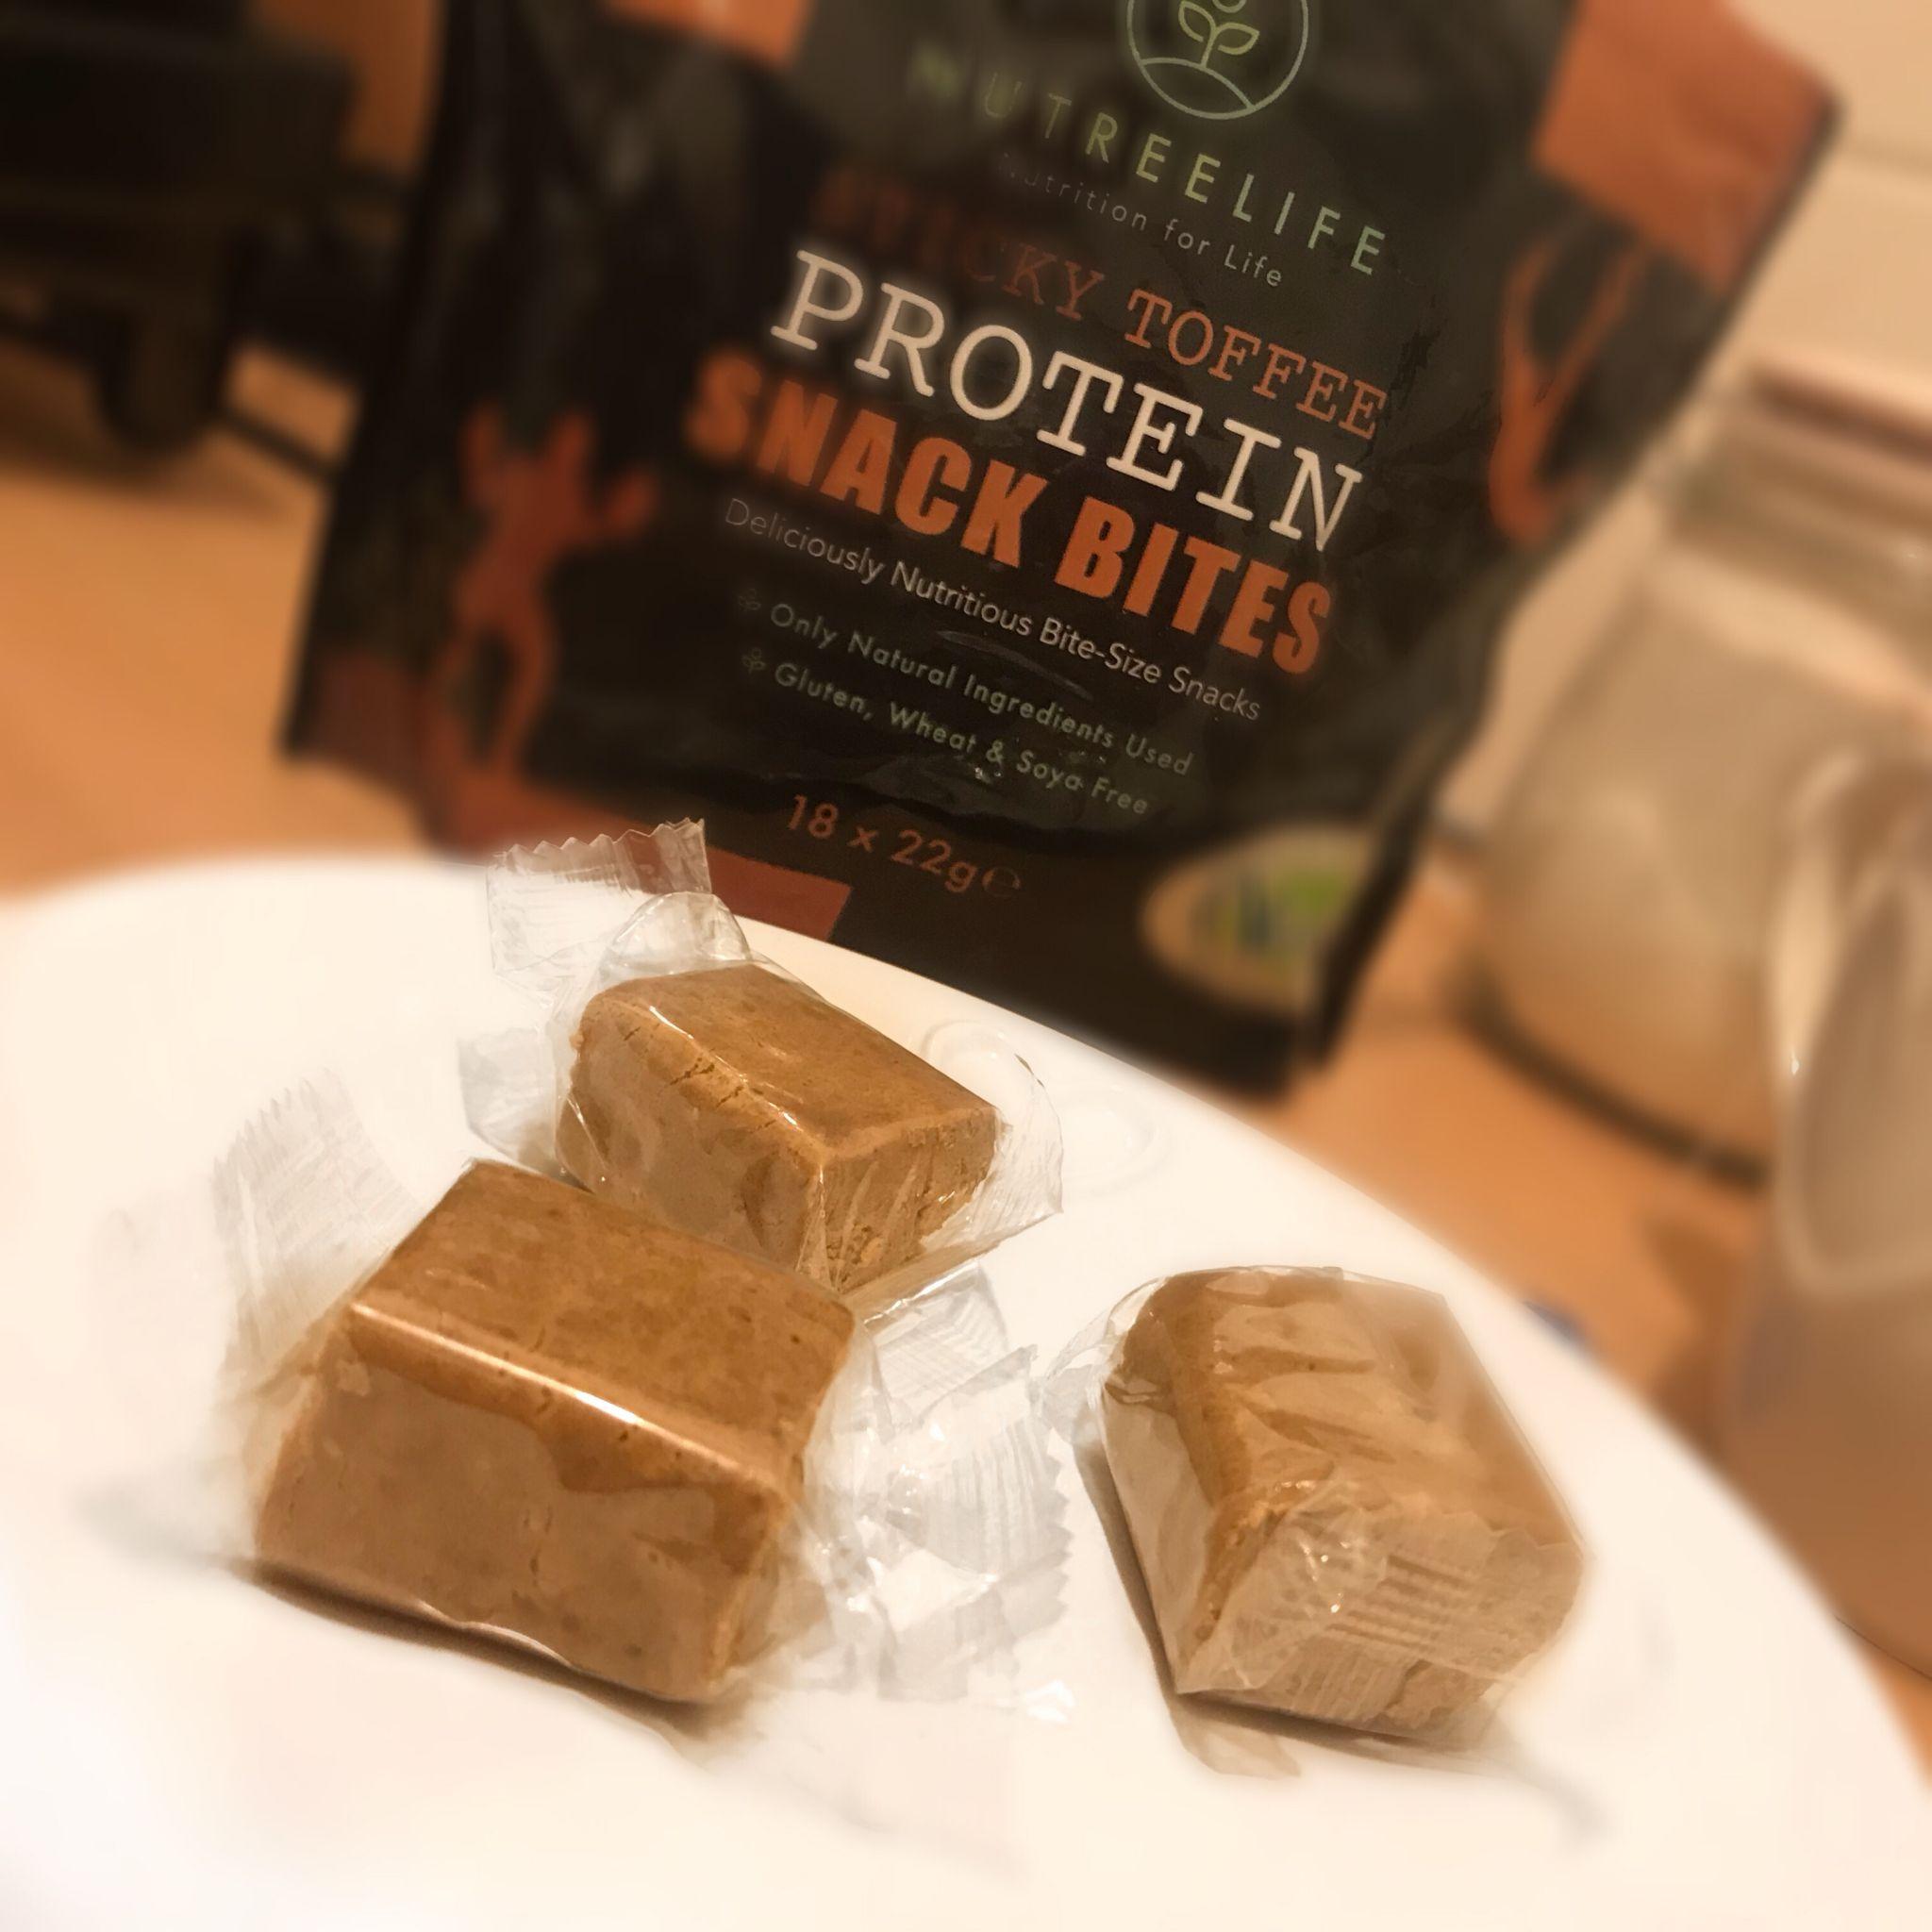 Putting Nutree Life snack bites to the test - Vegan & Gluten free